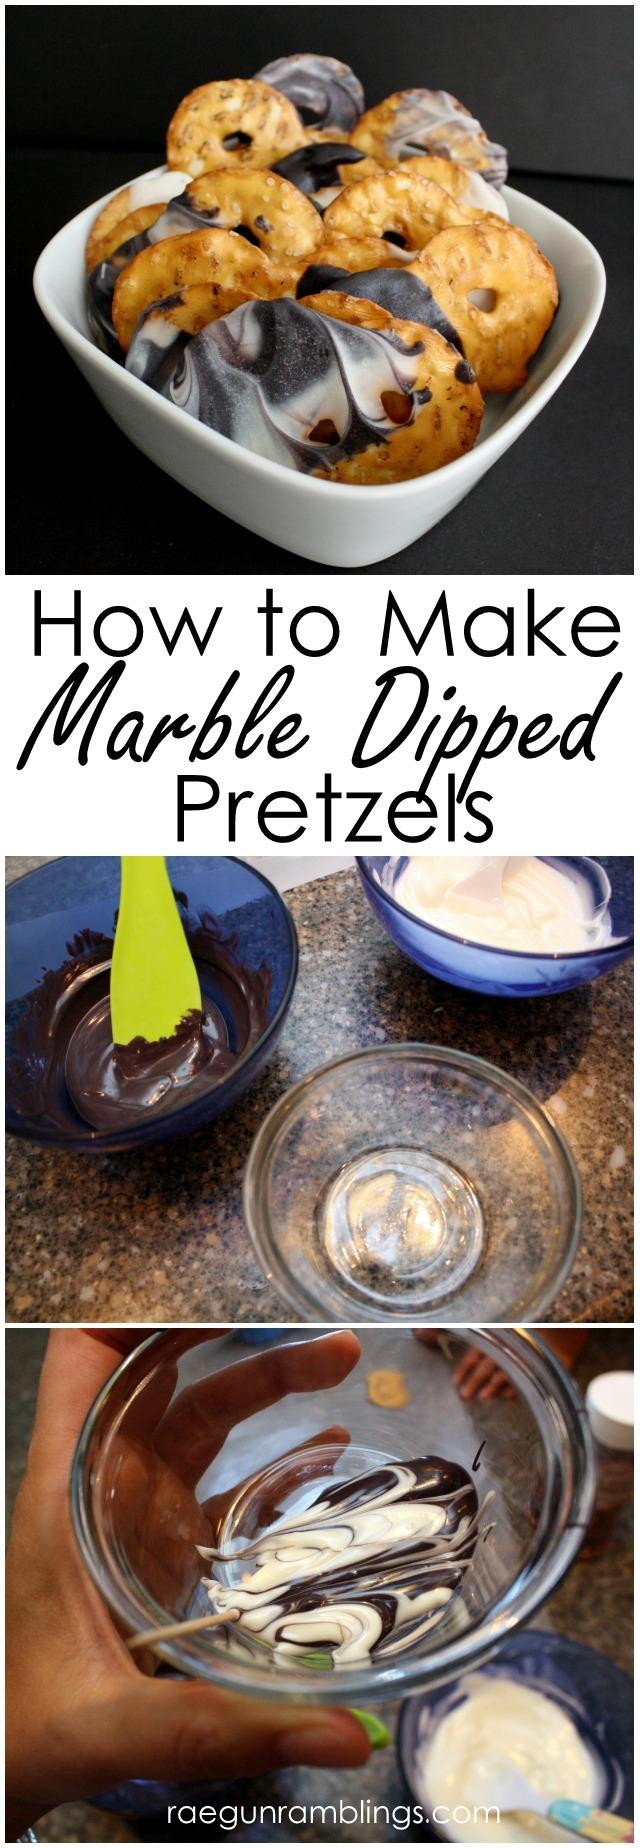 The easiest way to make marble chocolate dipped pretzels - Rae Gun Ramblings